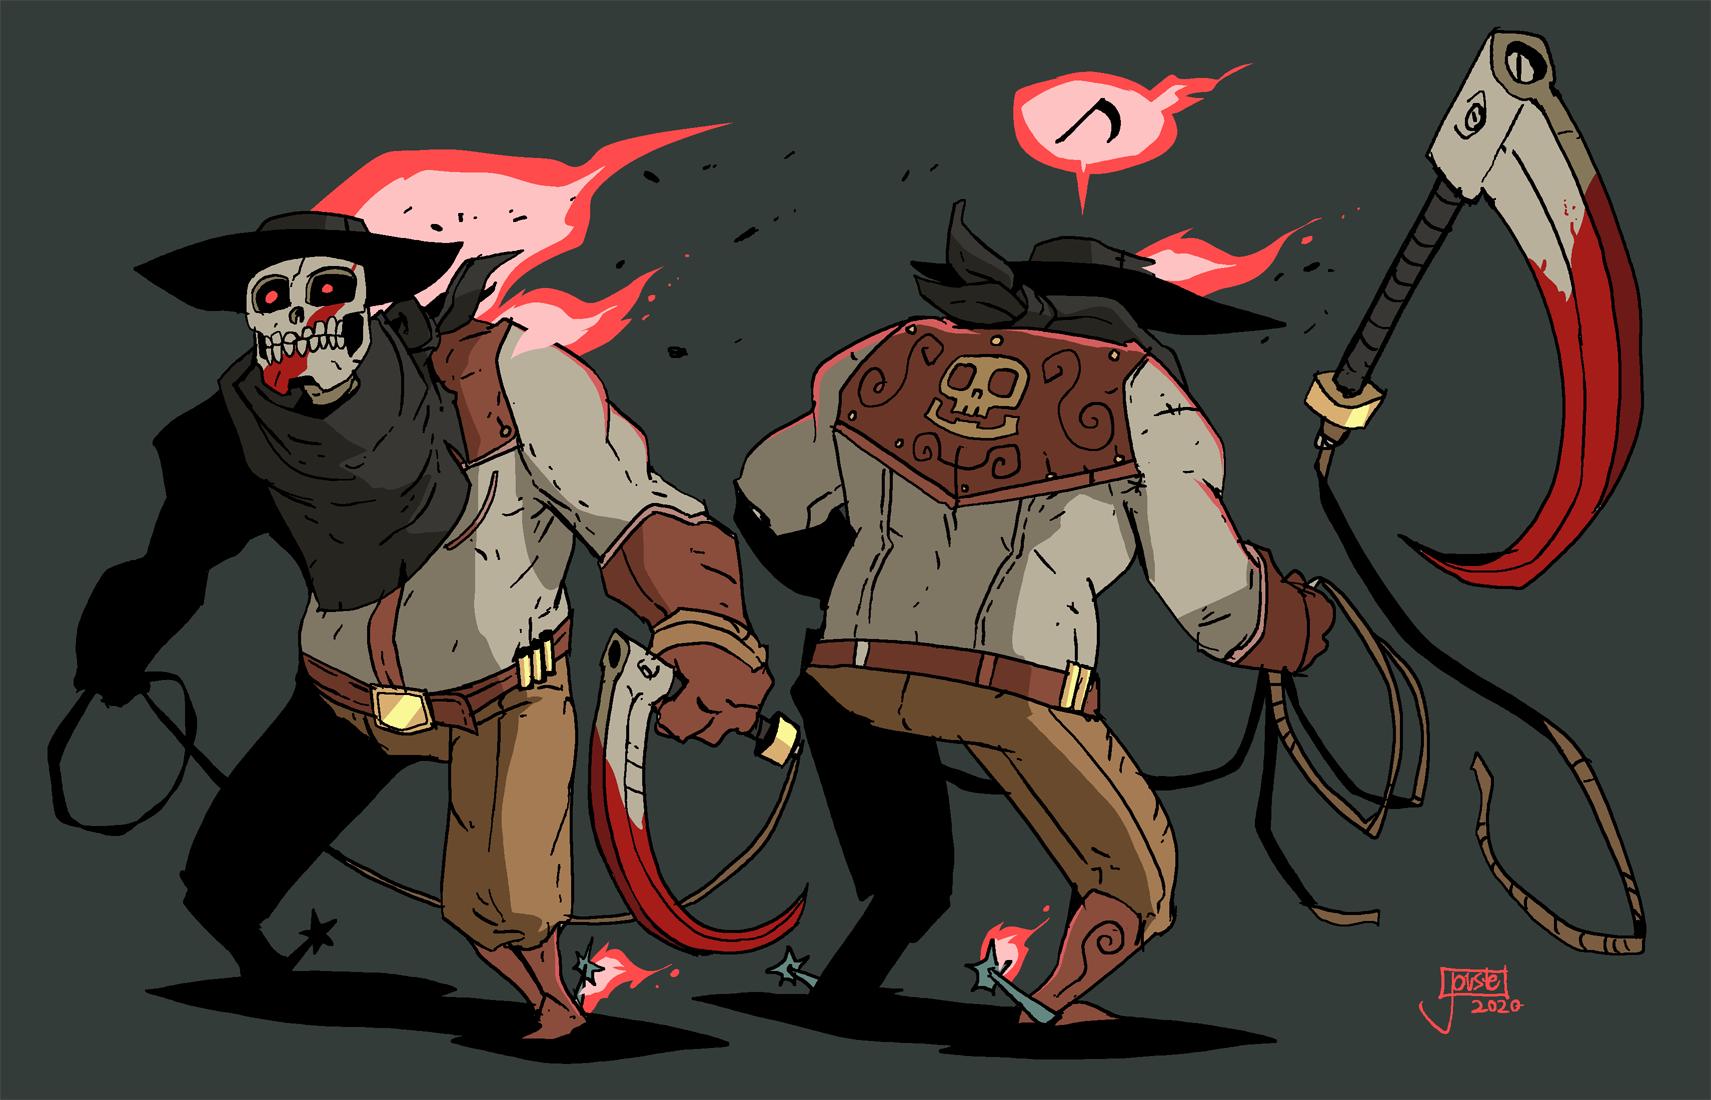 The Grim Rustler